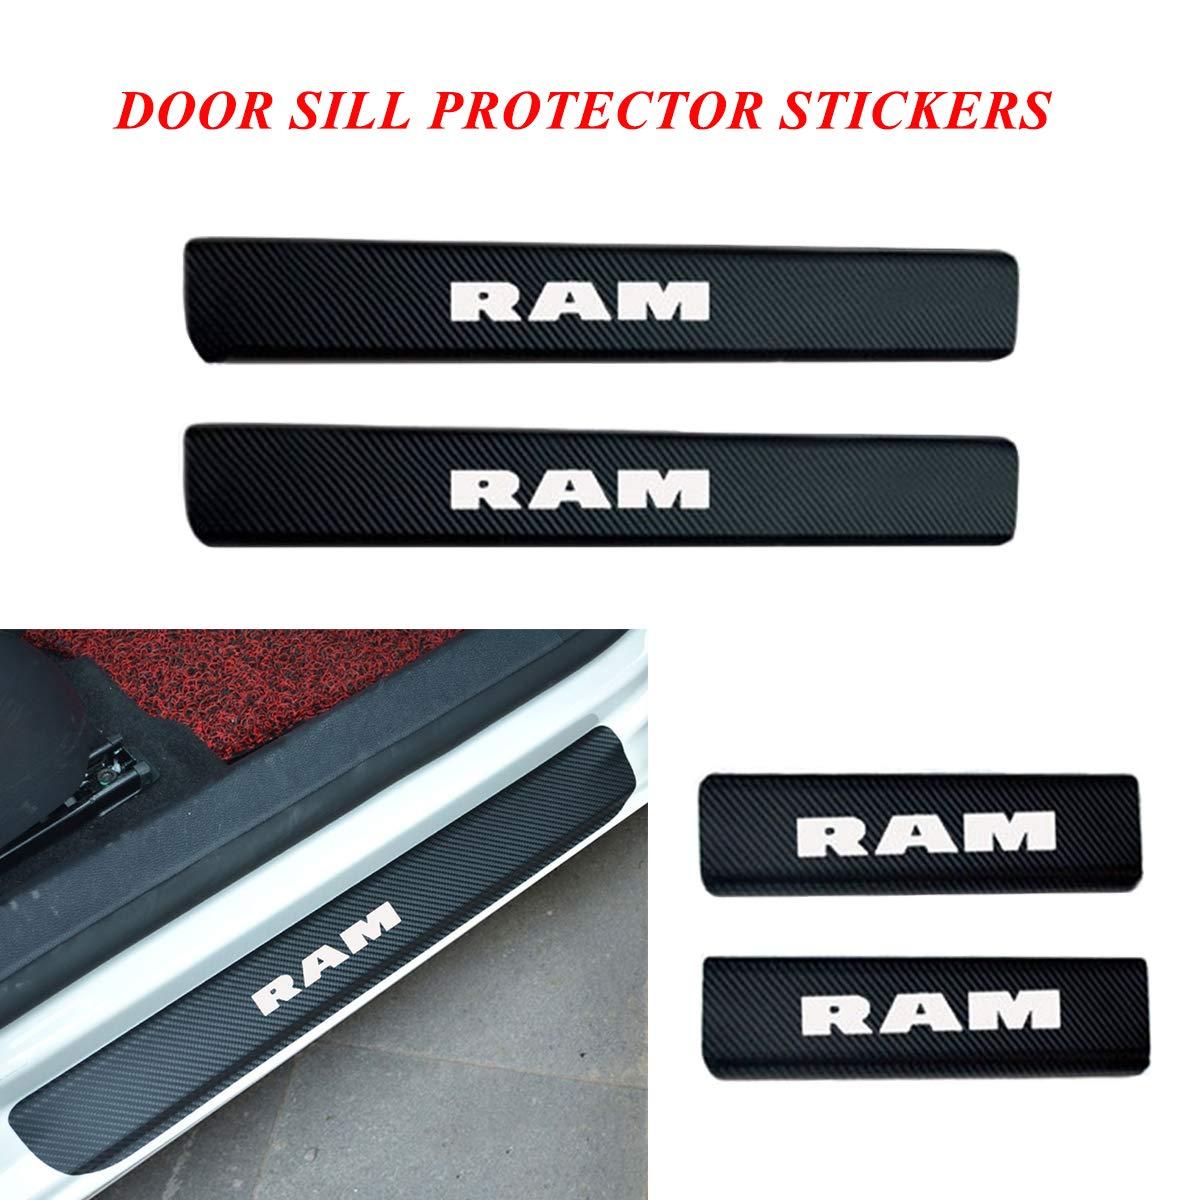 red SENYAZON RAM Sticker Carbon Fibre Vinyl Reflective Car Door Sill Decoration Scuff Plate for Dodge RAM Accessories